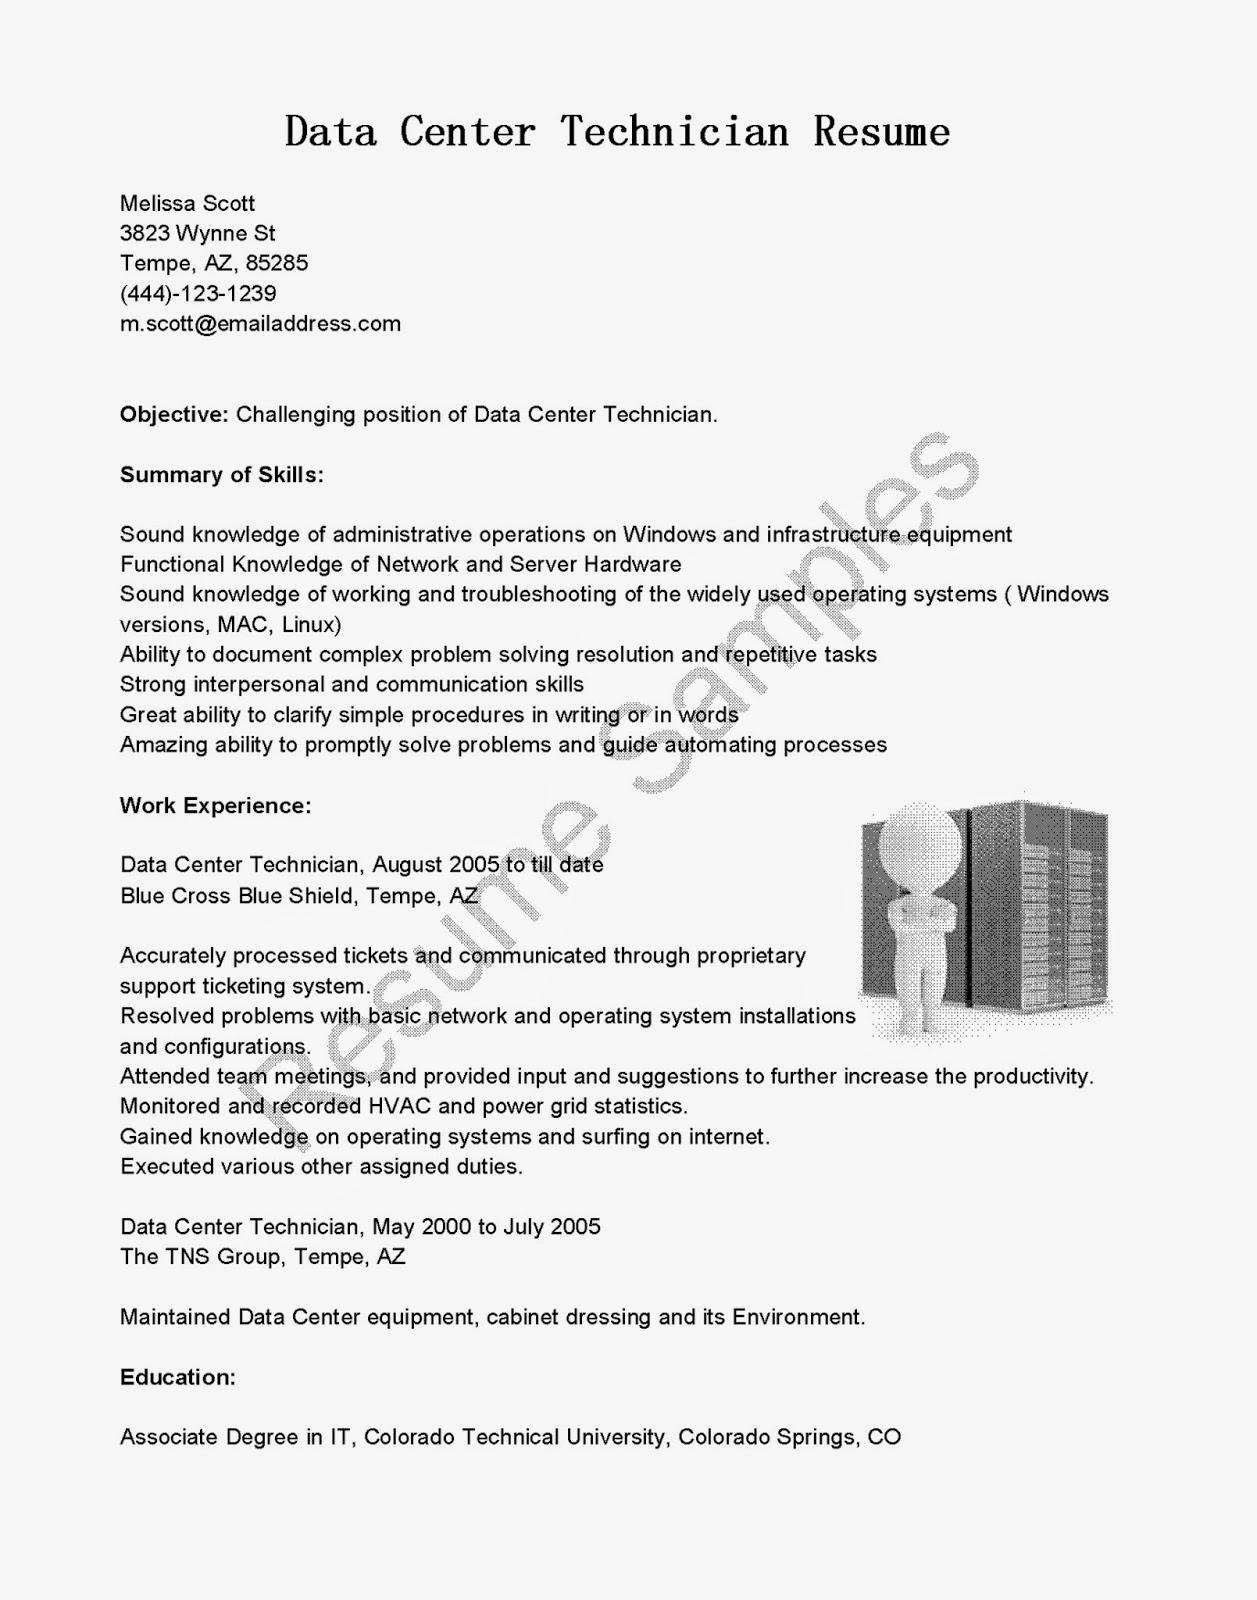 data center technician cover letter Parlobuenacocinaco